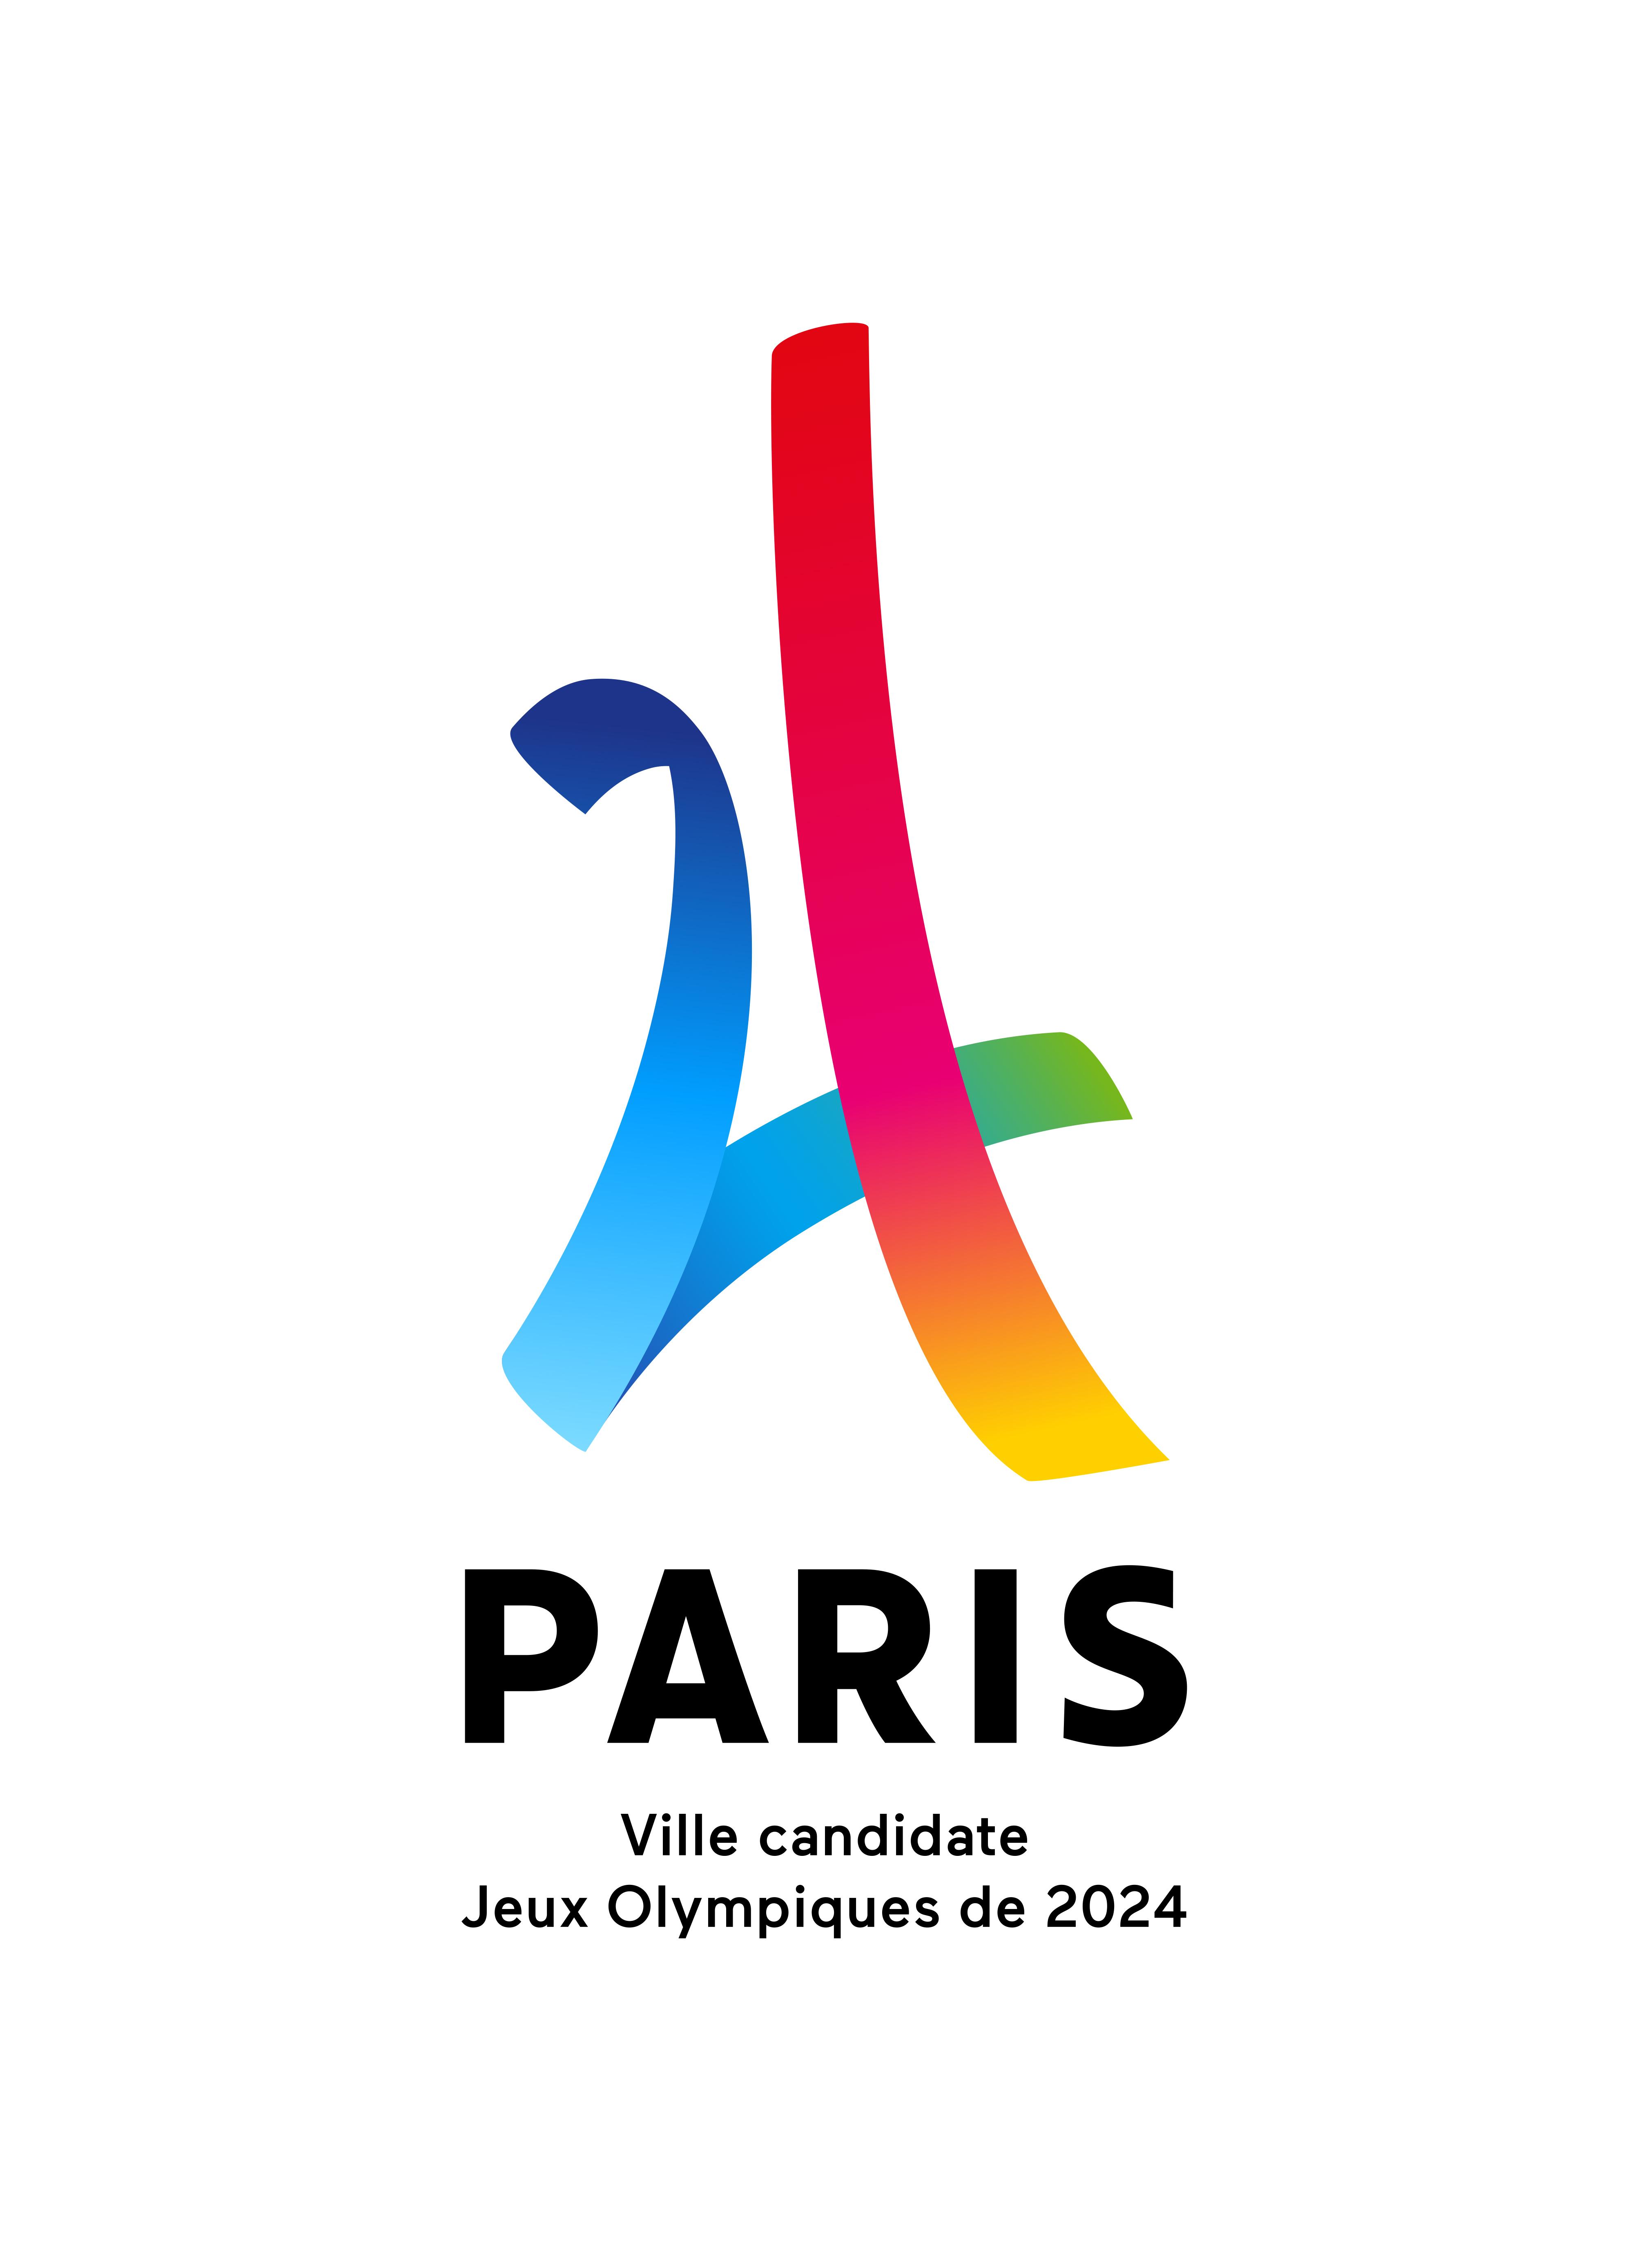 JeuxOlymp_paris2024FR_RVB_300dpi